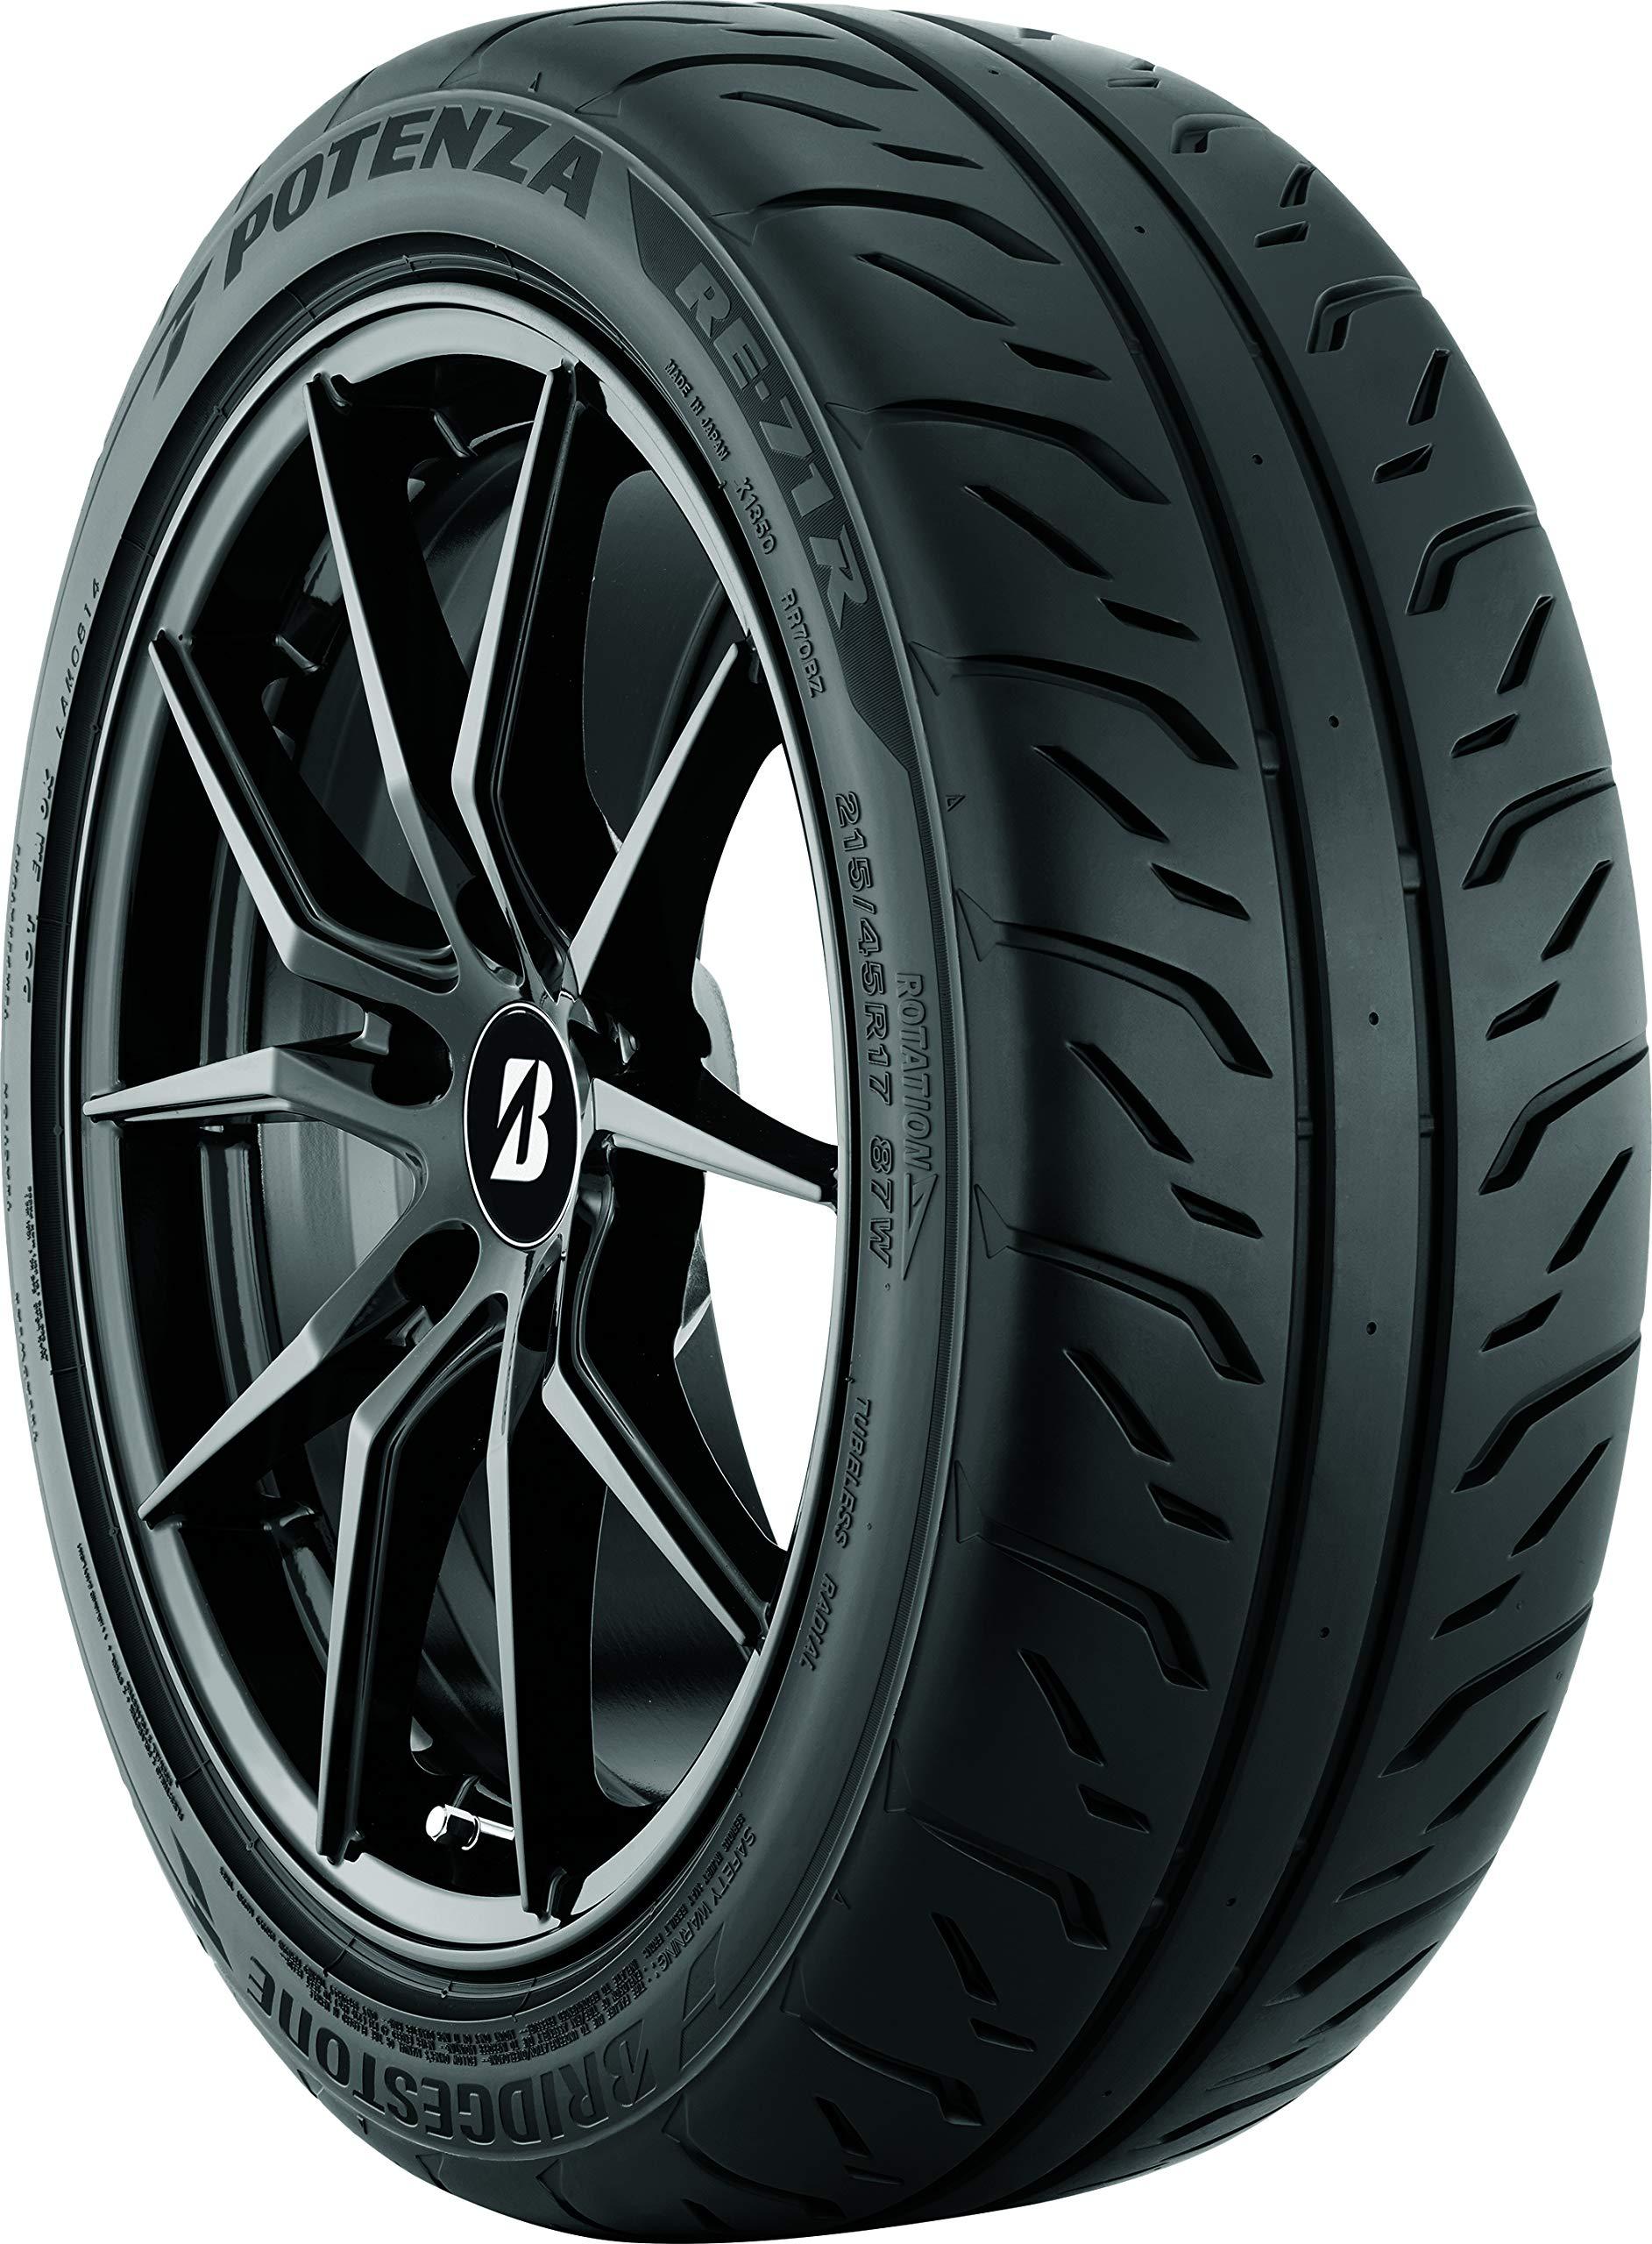 Bridgestone Potenza RE-71R Ultra High Peformance Tire 225/45R17 94 W Extra Load